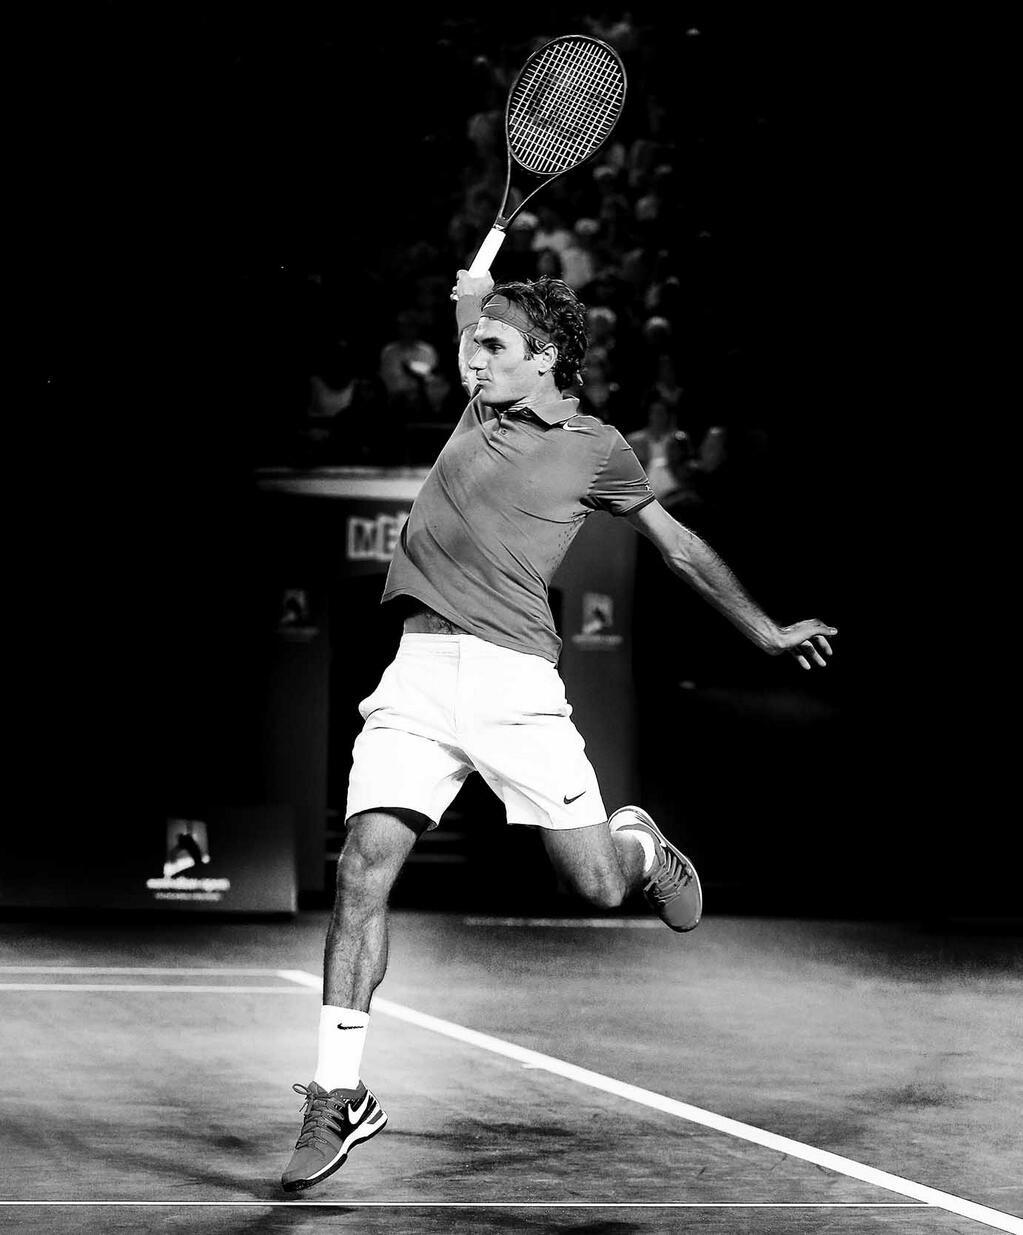 Hotness에 있는 Yuichi Murakami님의 핀 스포츠 사진 테니스 스포츠